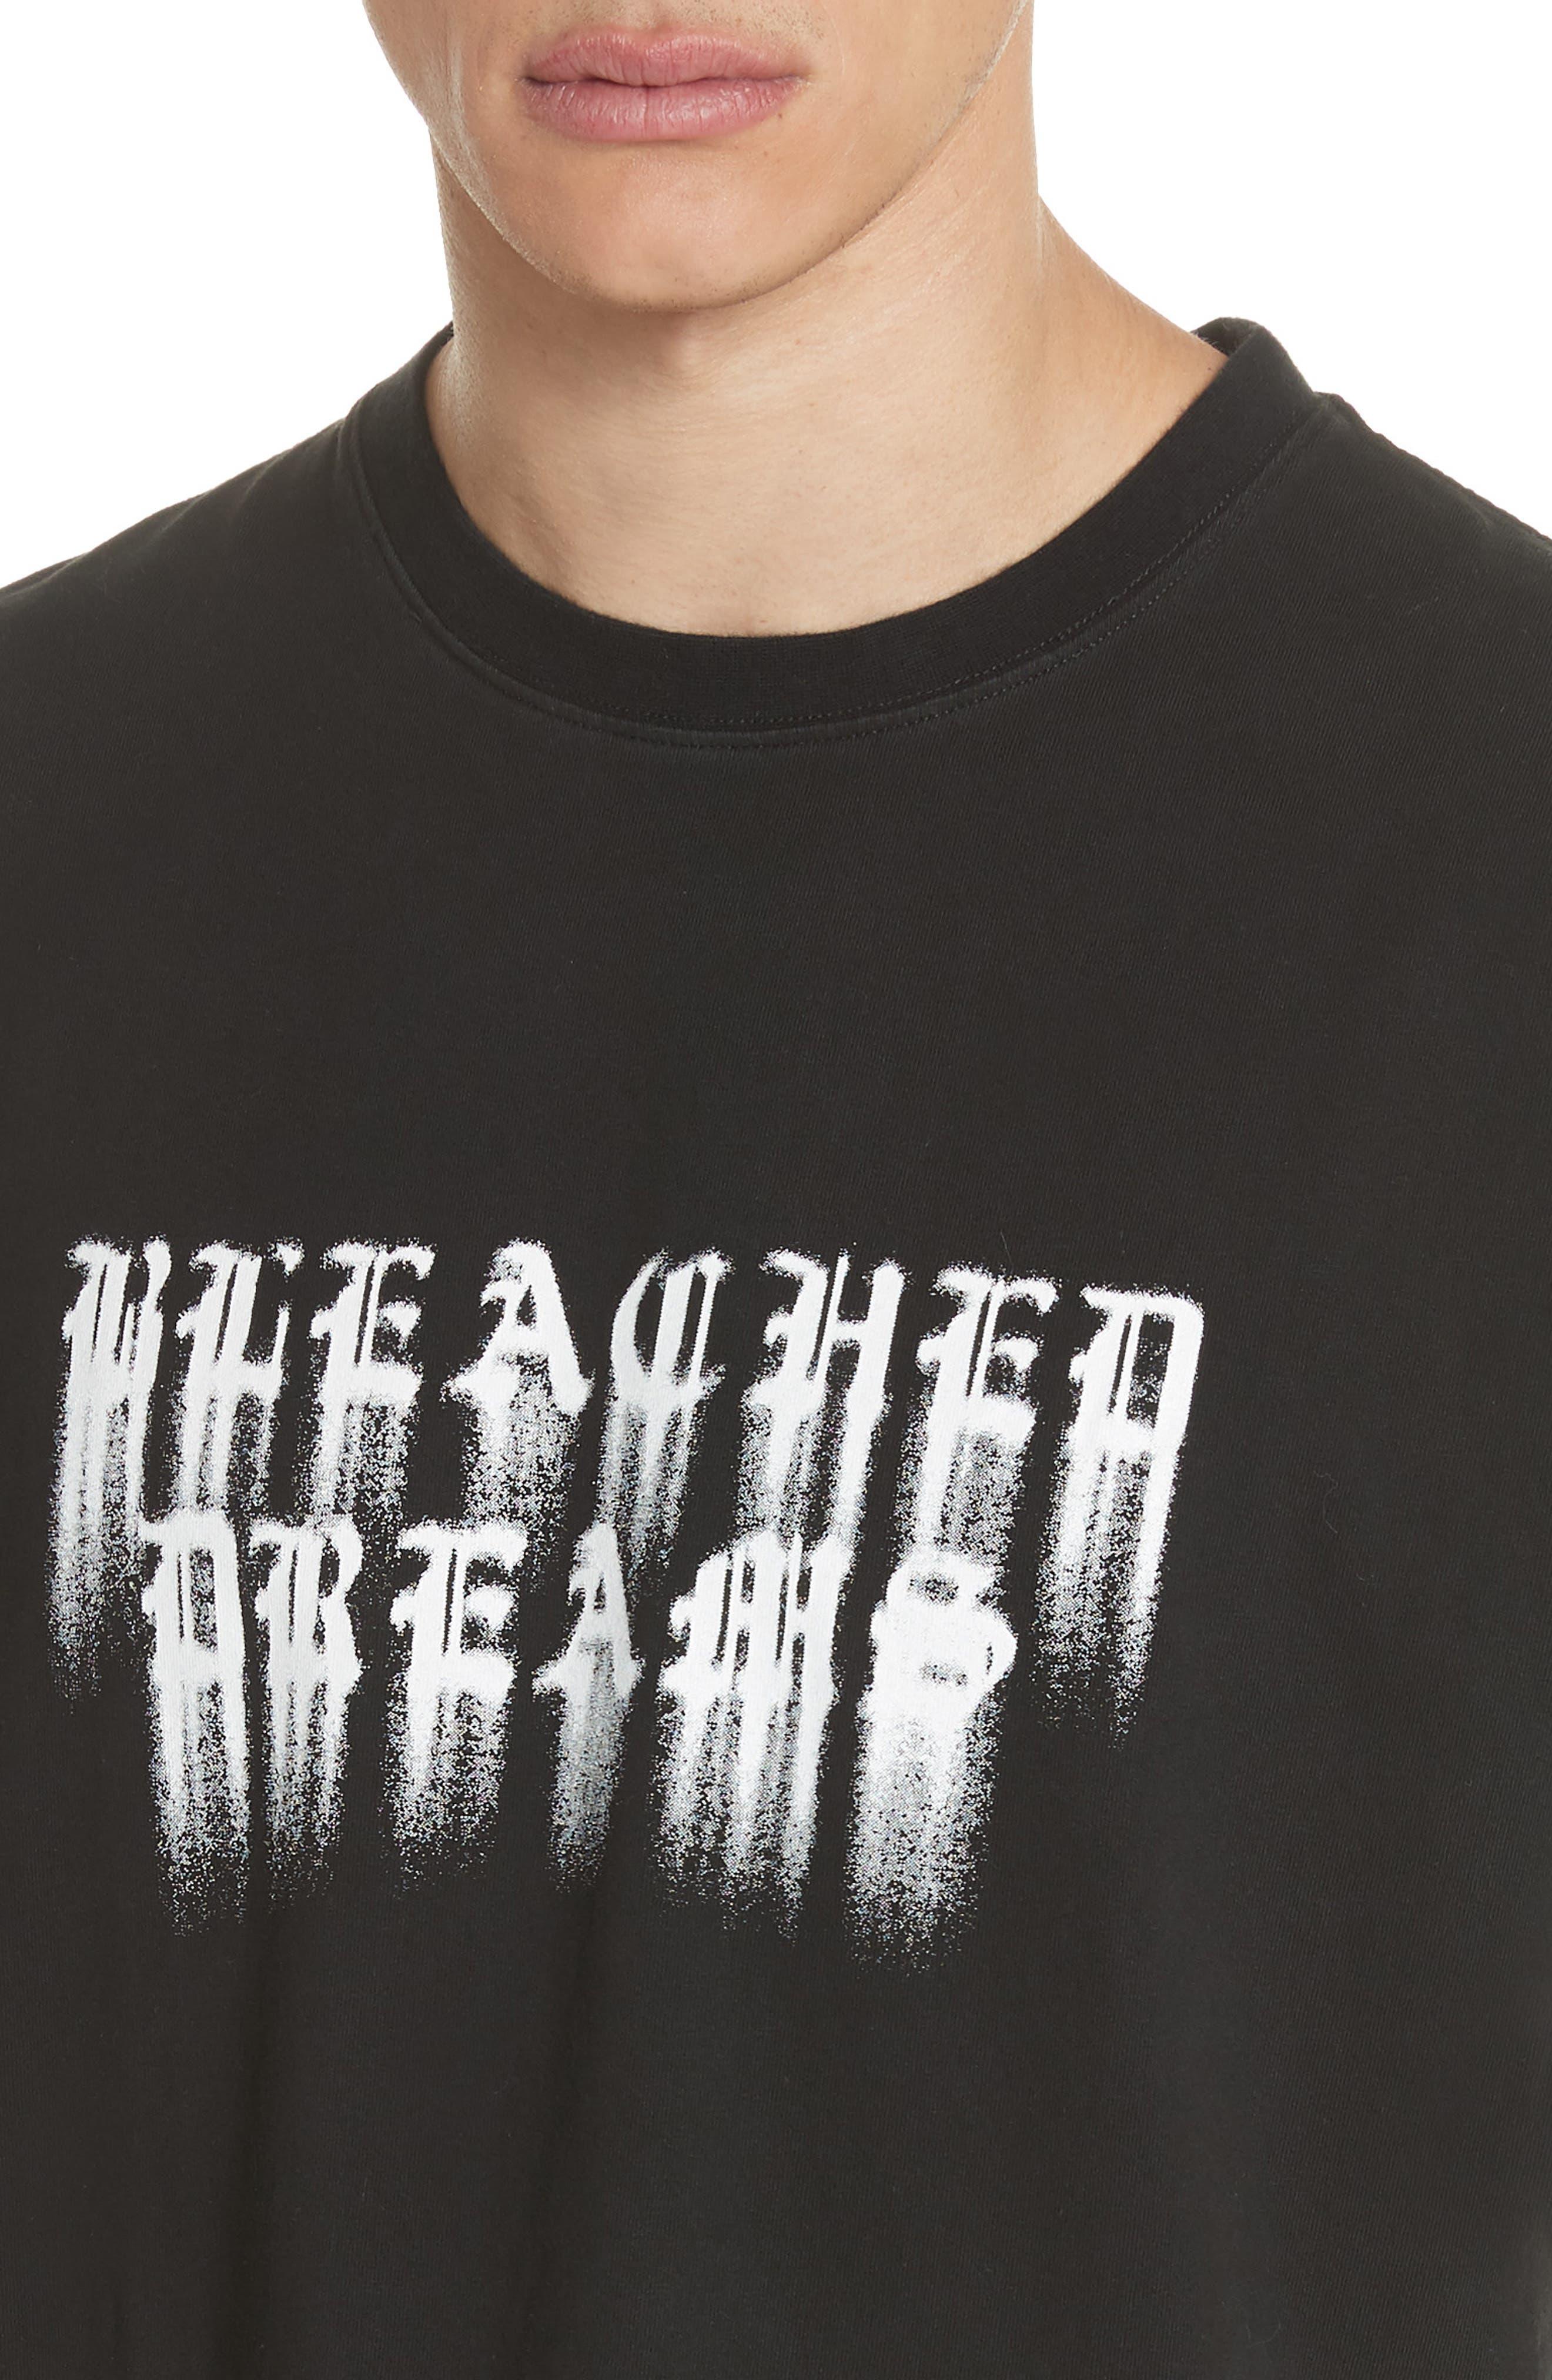 Bleached Dreams Graphic T-Shirt,                             Alternate thumbnail 4, color,                             001